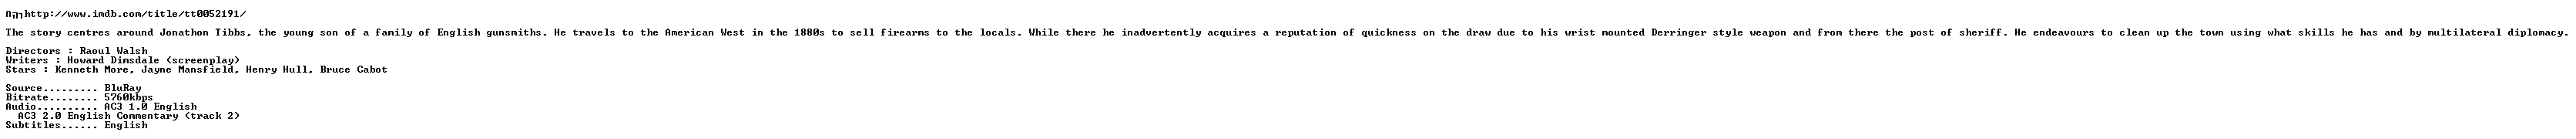 The Sheriff of Fractured Jaw 1958 1080p BluRay x264-nikt0